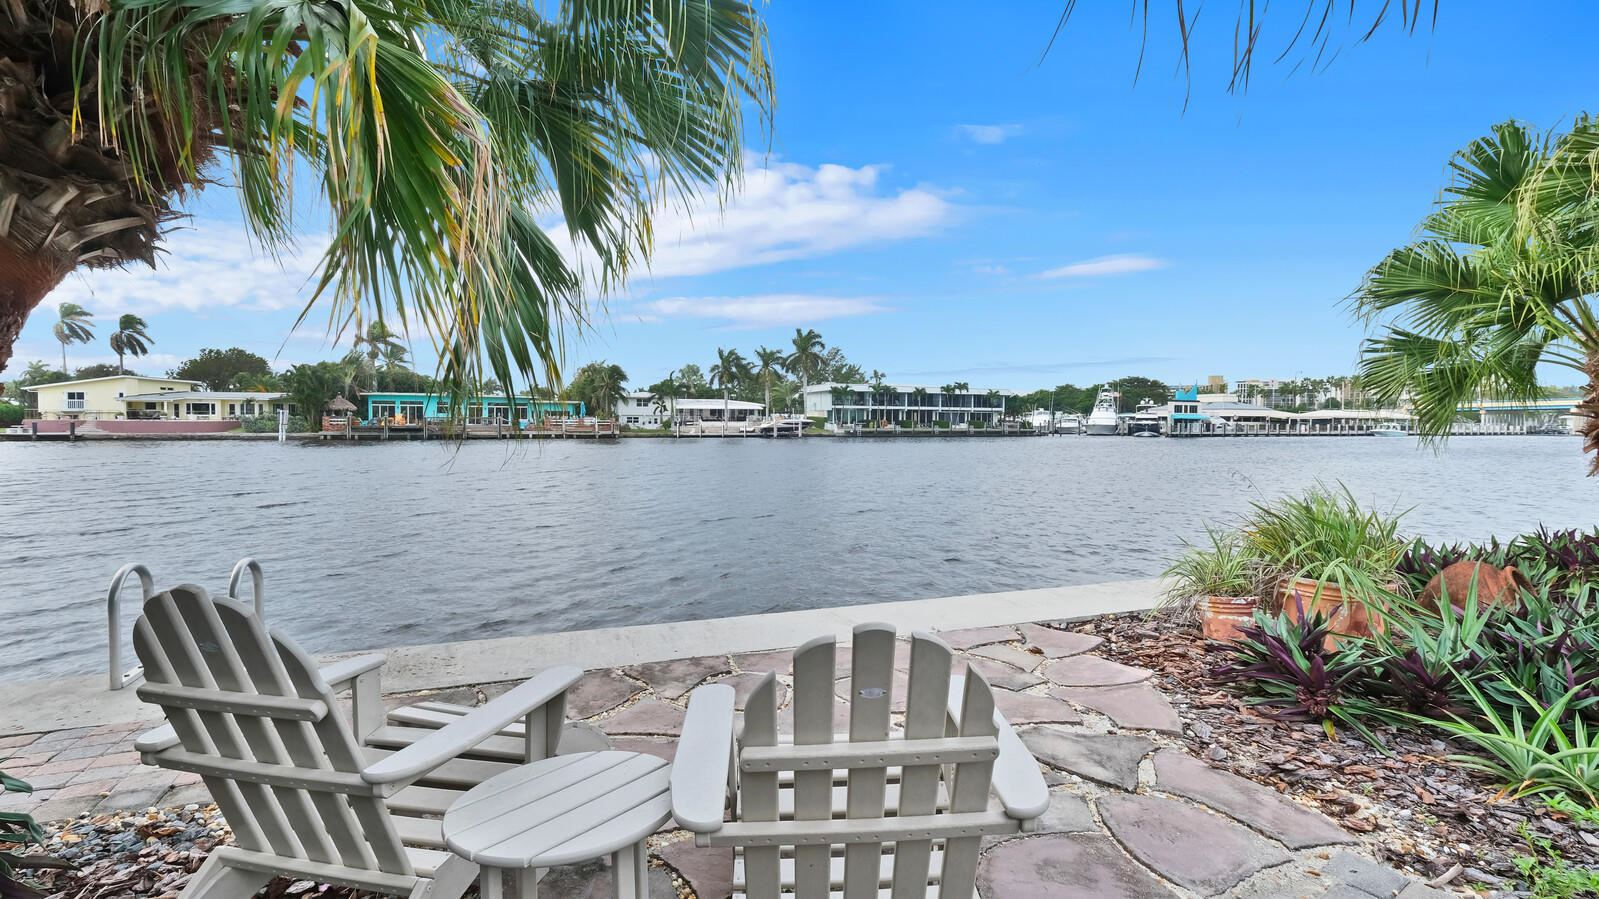 Photo of 233 SE 18th Avenue, Deerfield Beach, FL 33441 (MLS # RX-10670777)